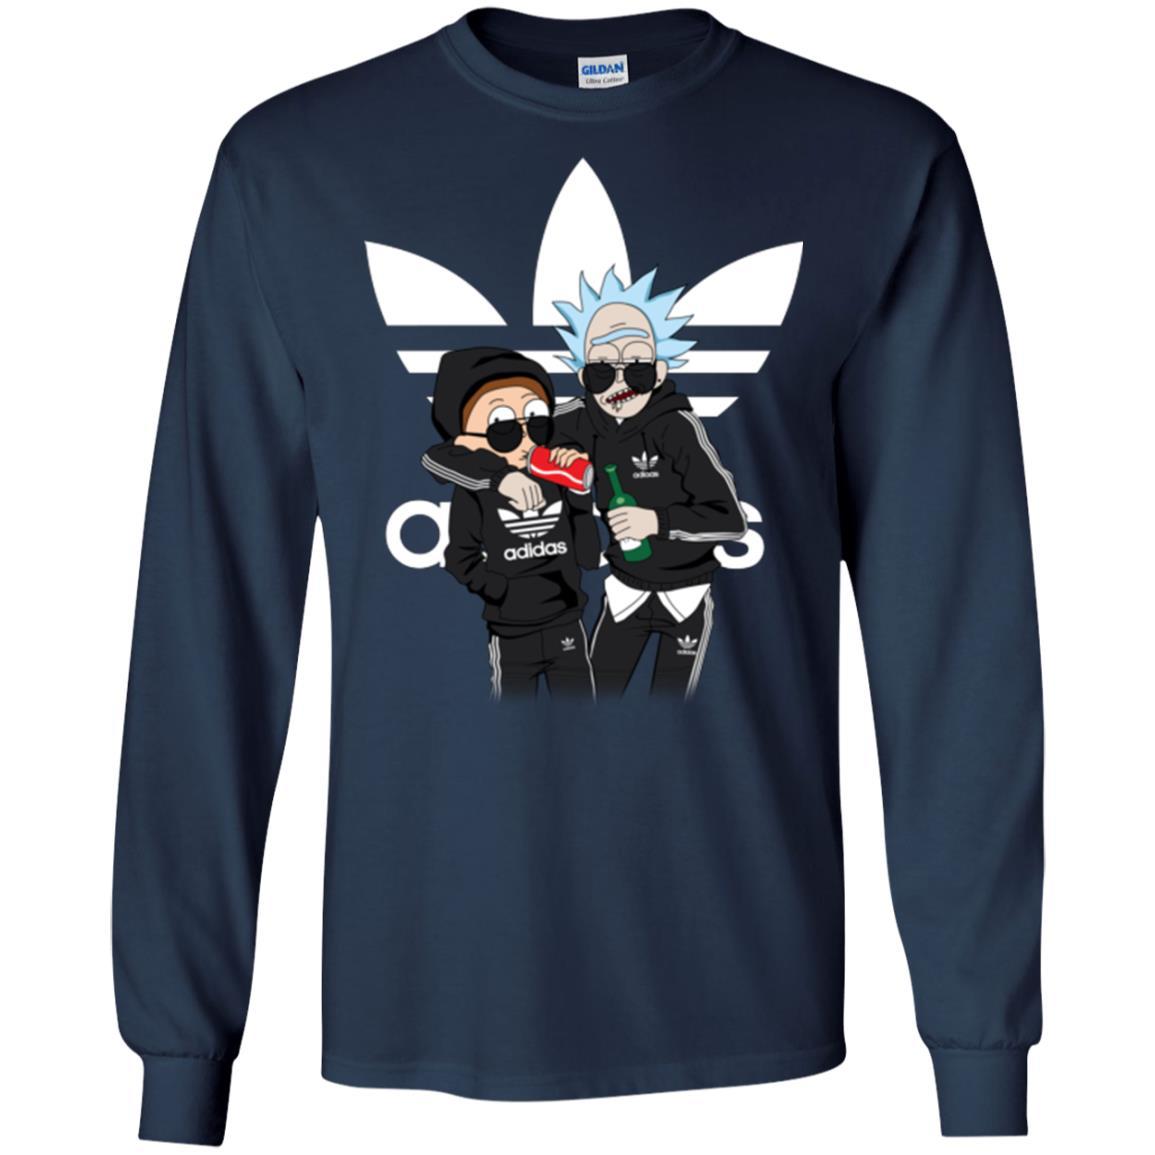 image 289px Rick and Morty Adidas Mashup T Shirt, Hoodies, Tank Top